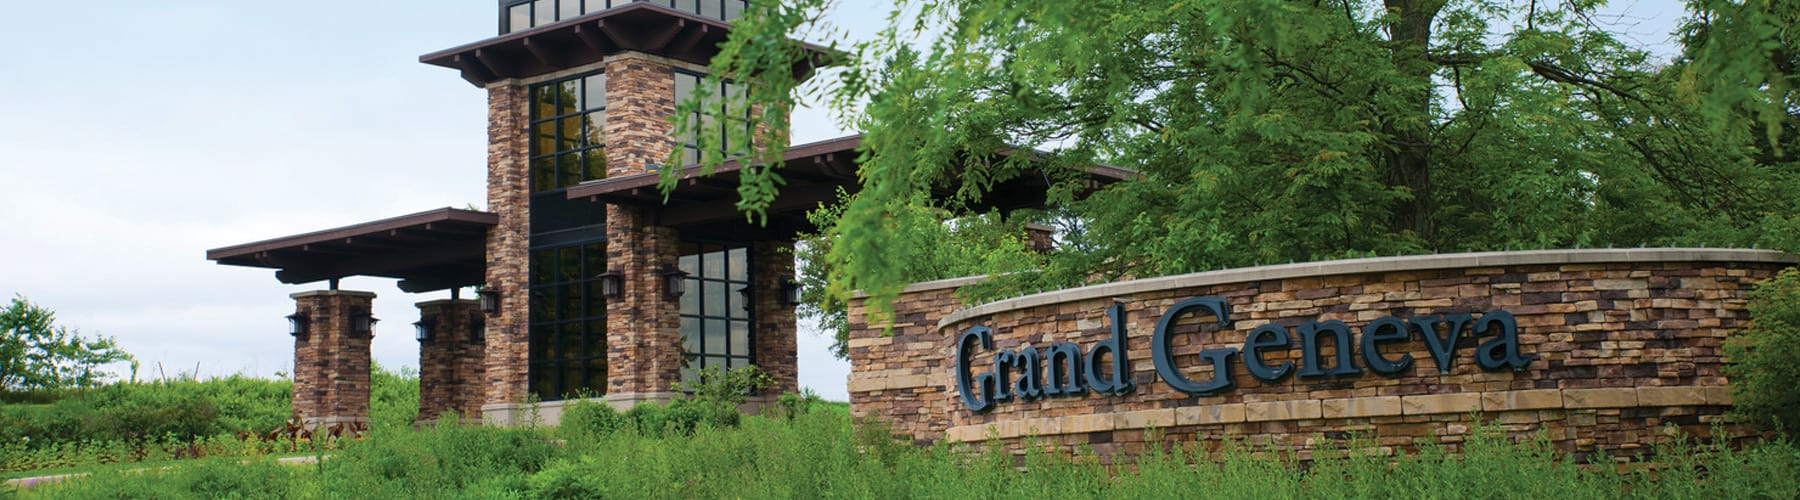 About Grand Geneva